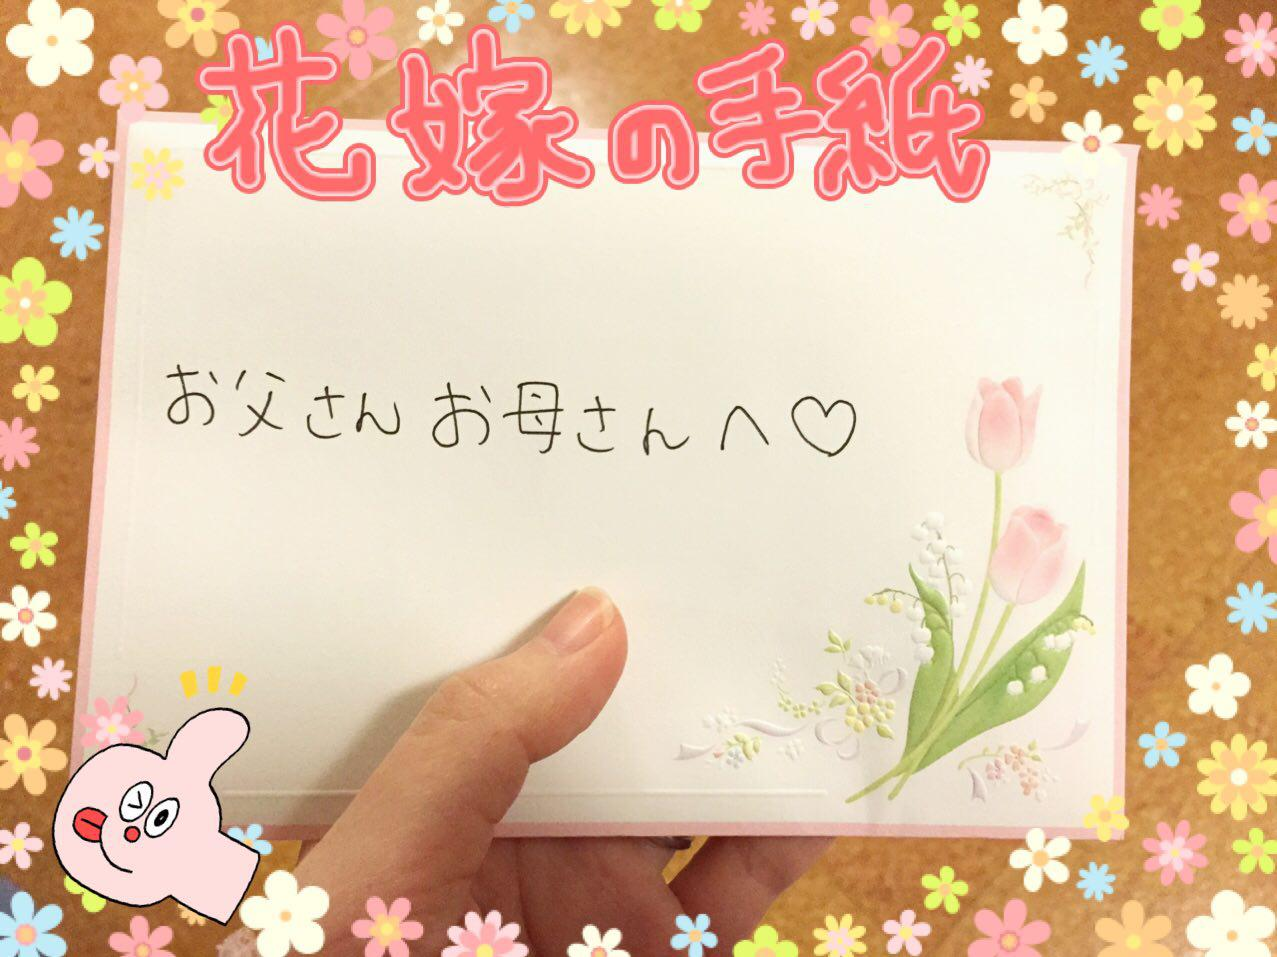 photo_2017-04-23_00-03-30.jpg